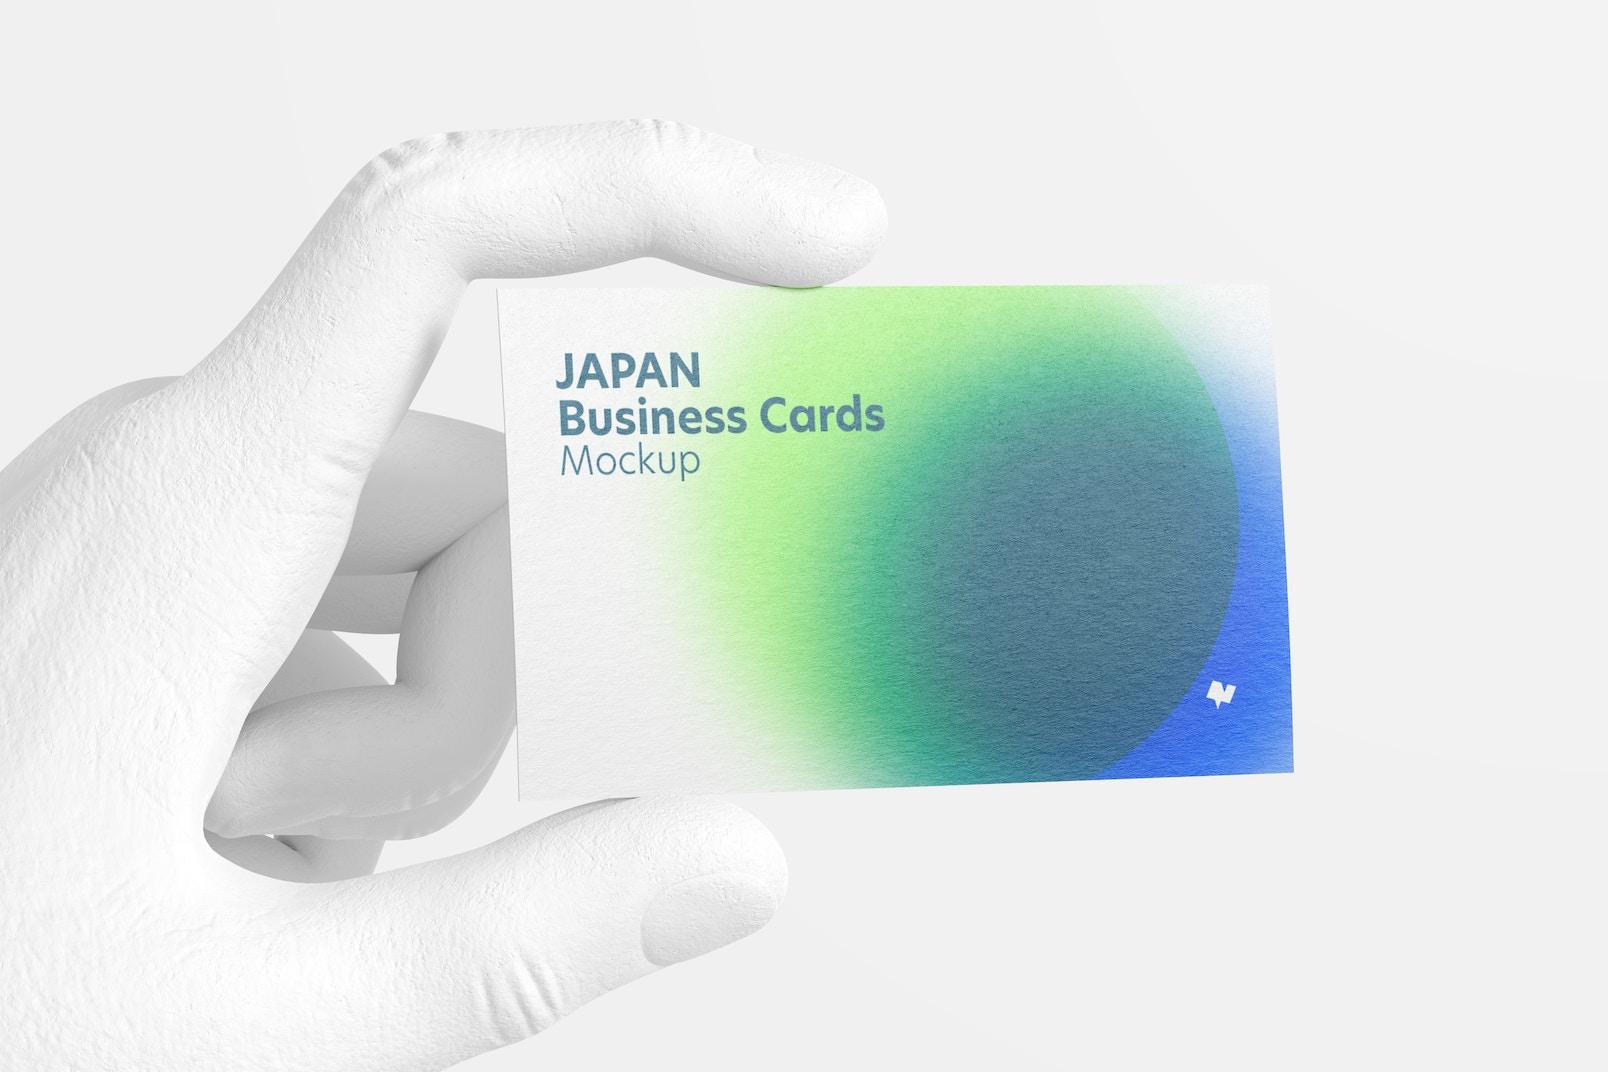 Japan Landscape Business Card with Hand Mockup